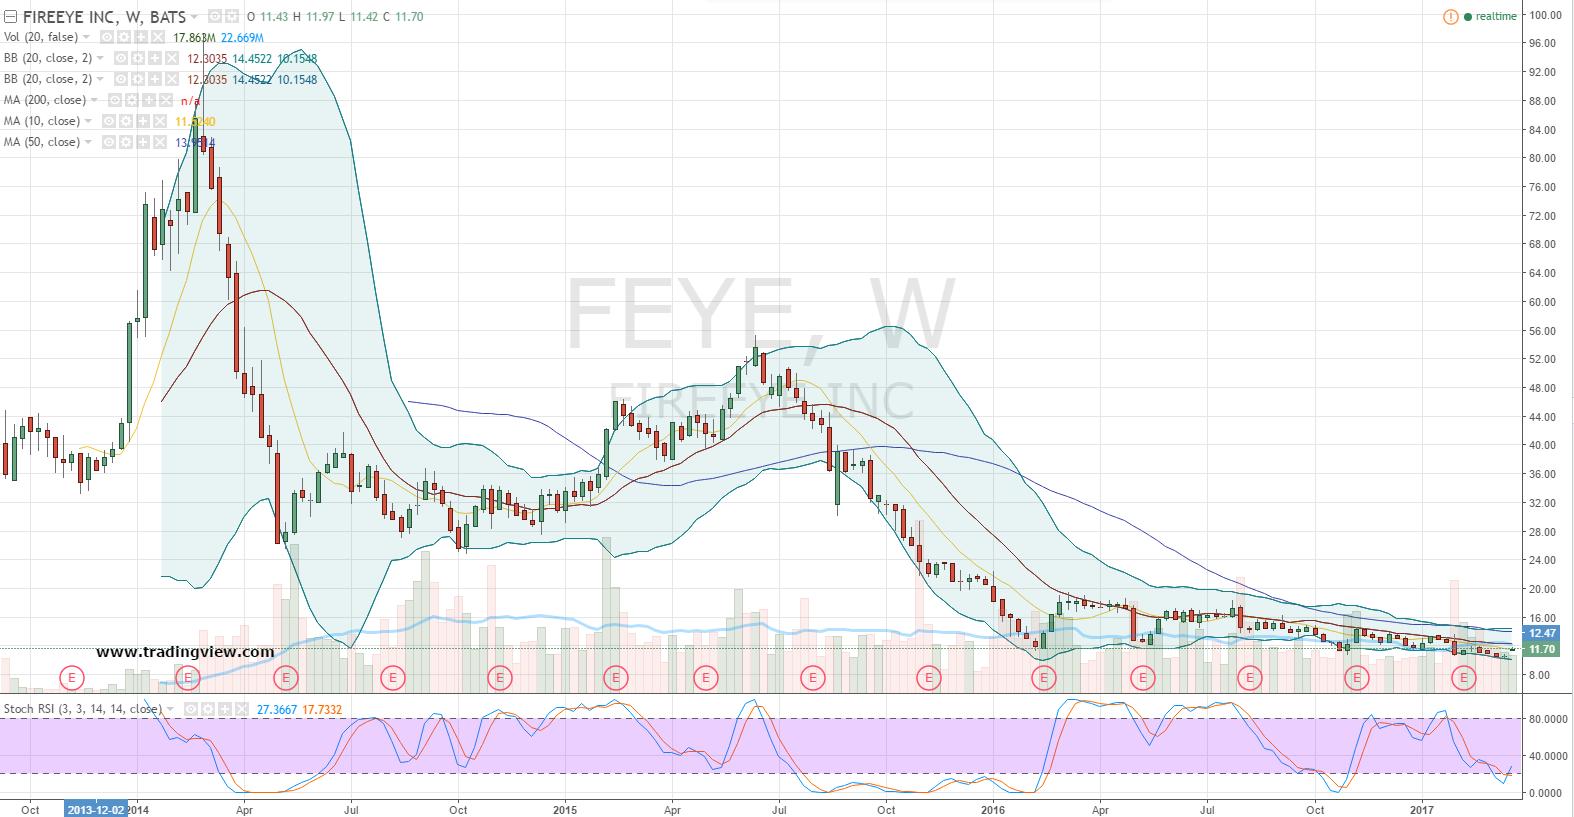 How to Play the FireEye Inc (FEYE) Stock Turnaround